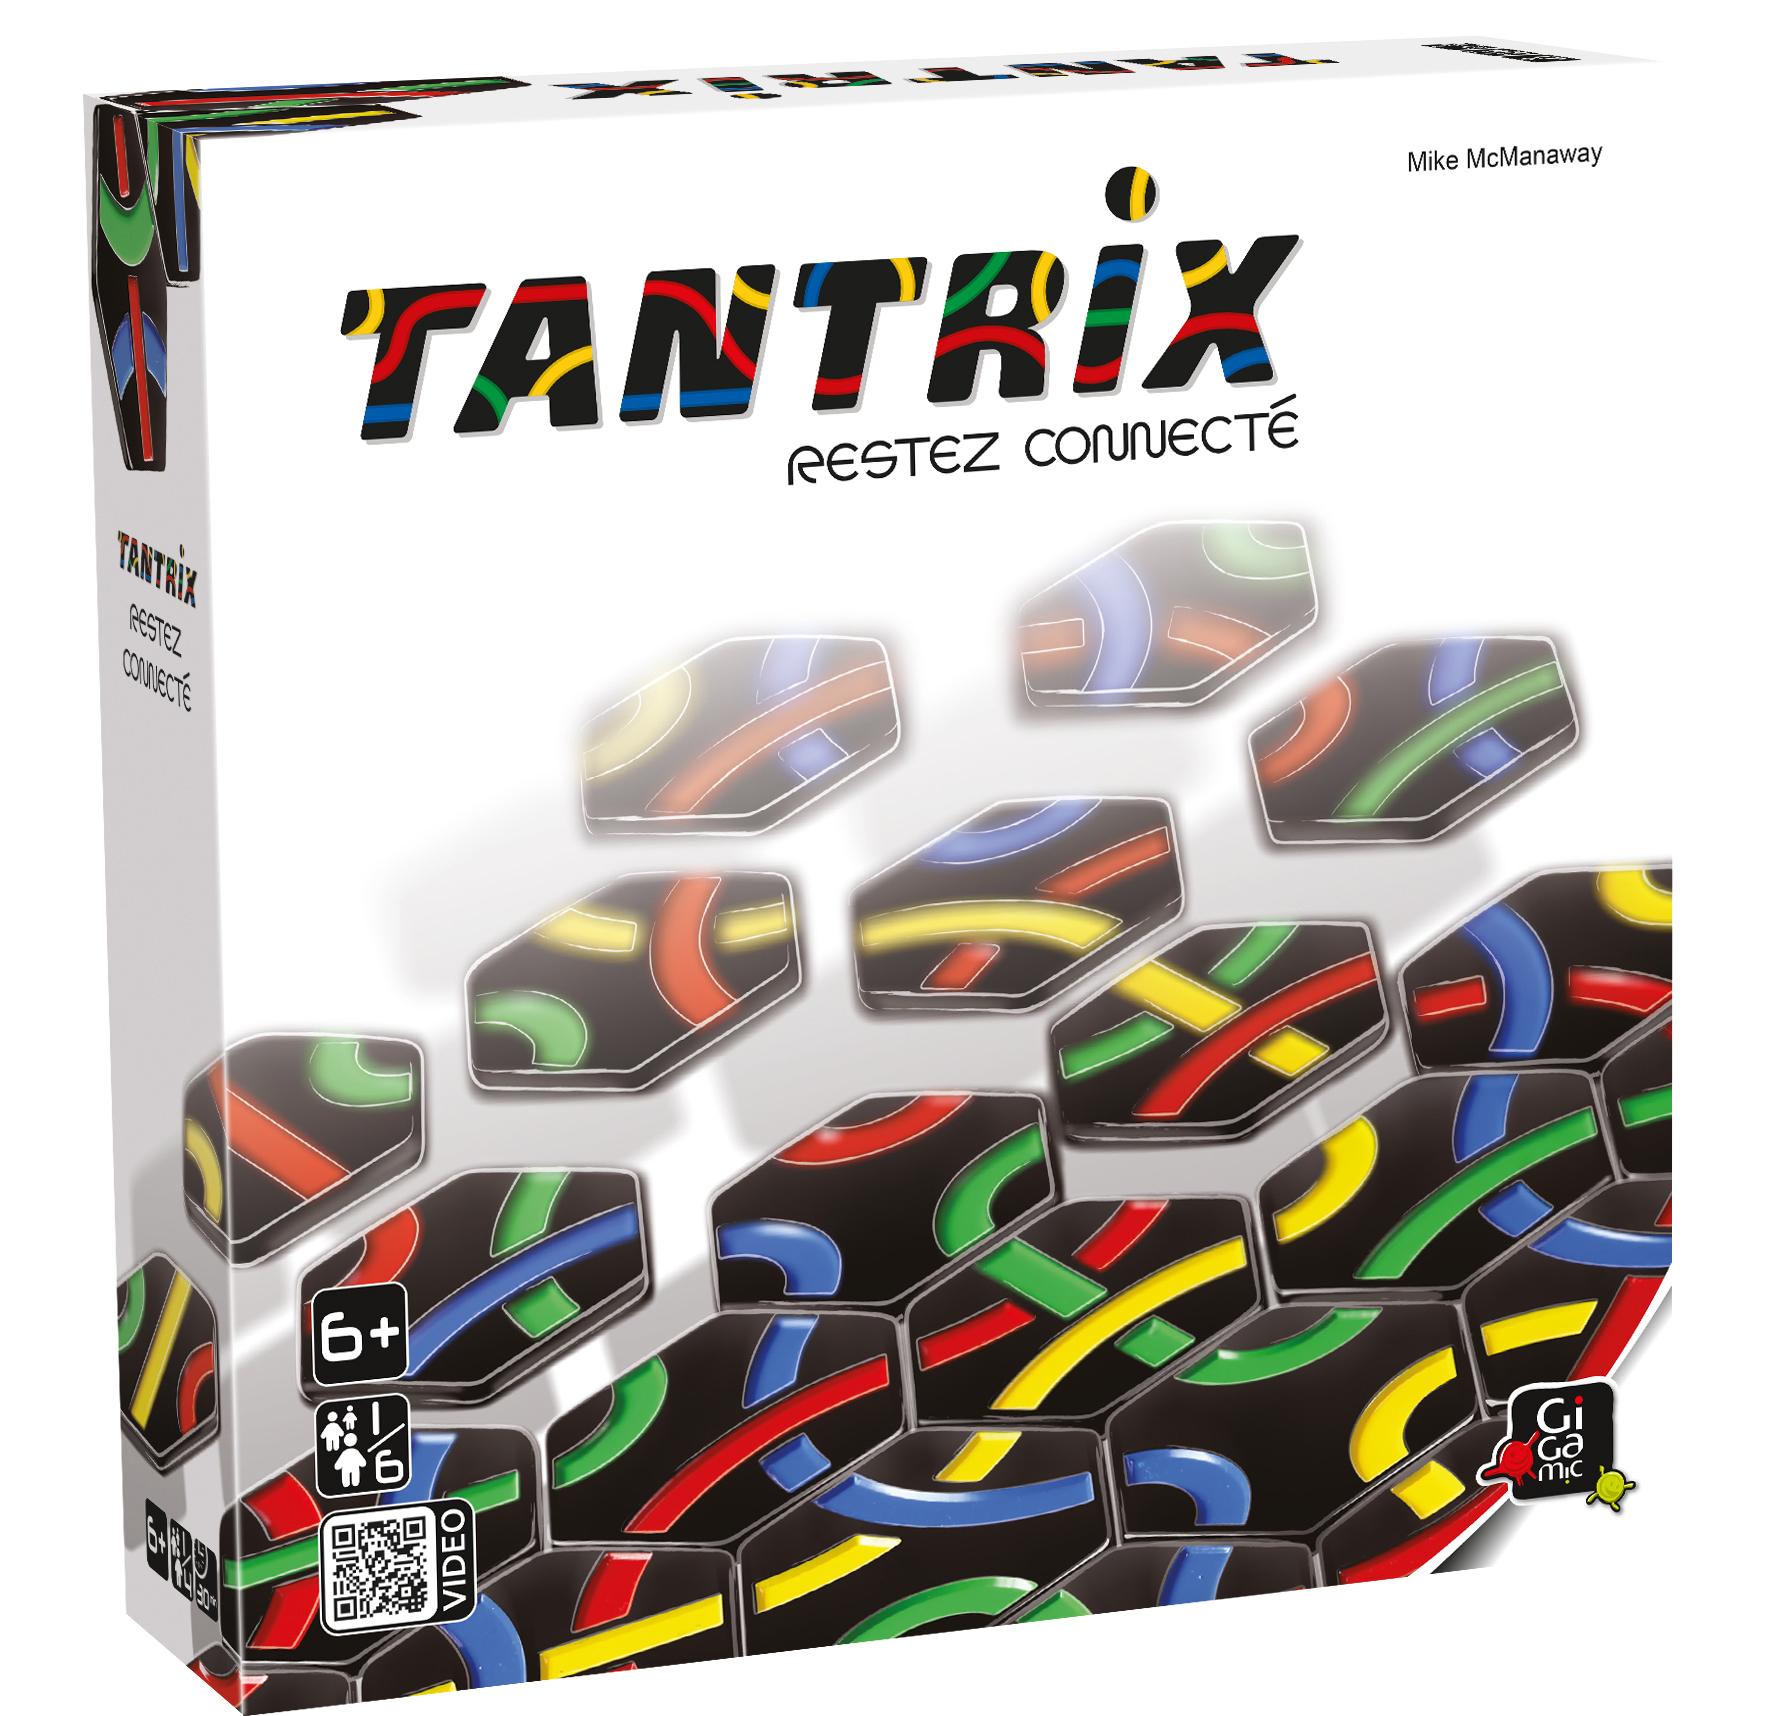 Tantrix - Gigamic